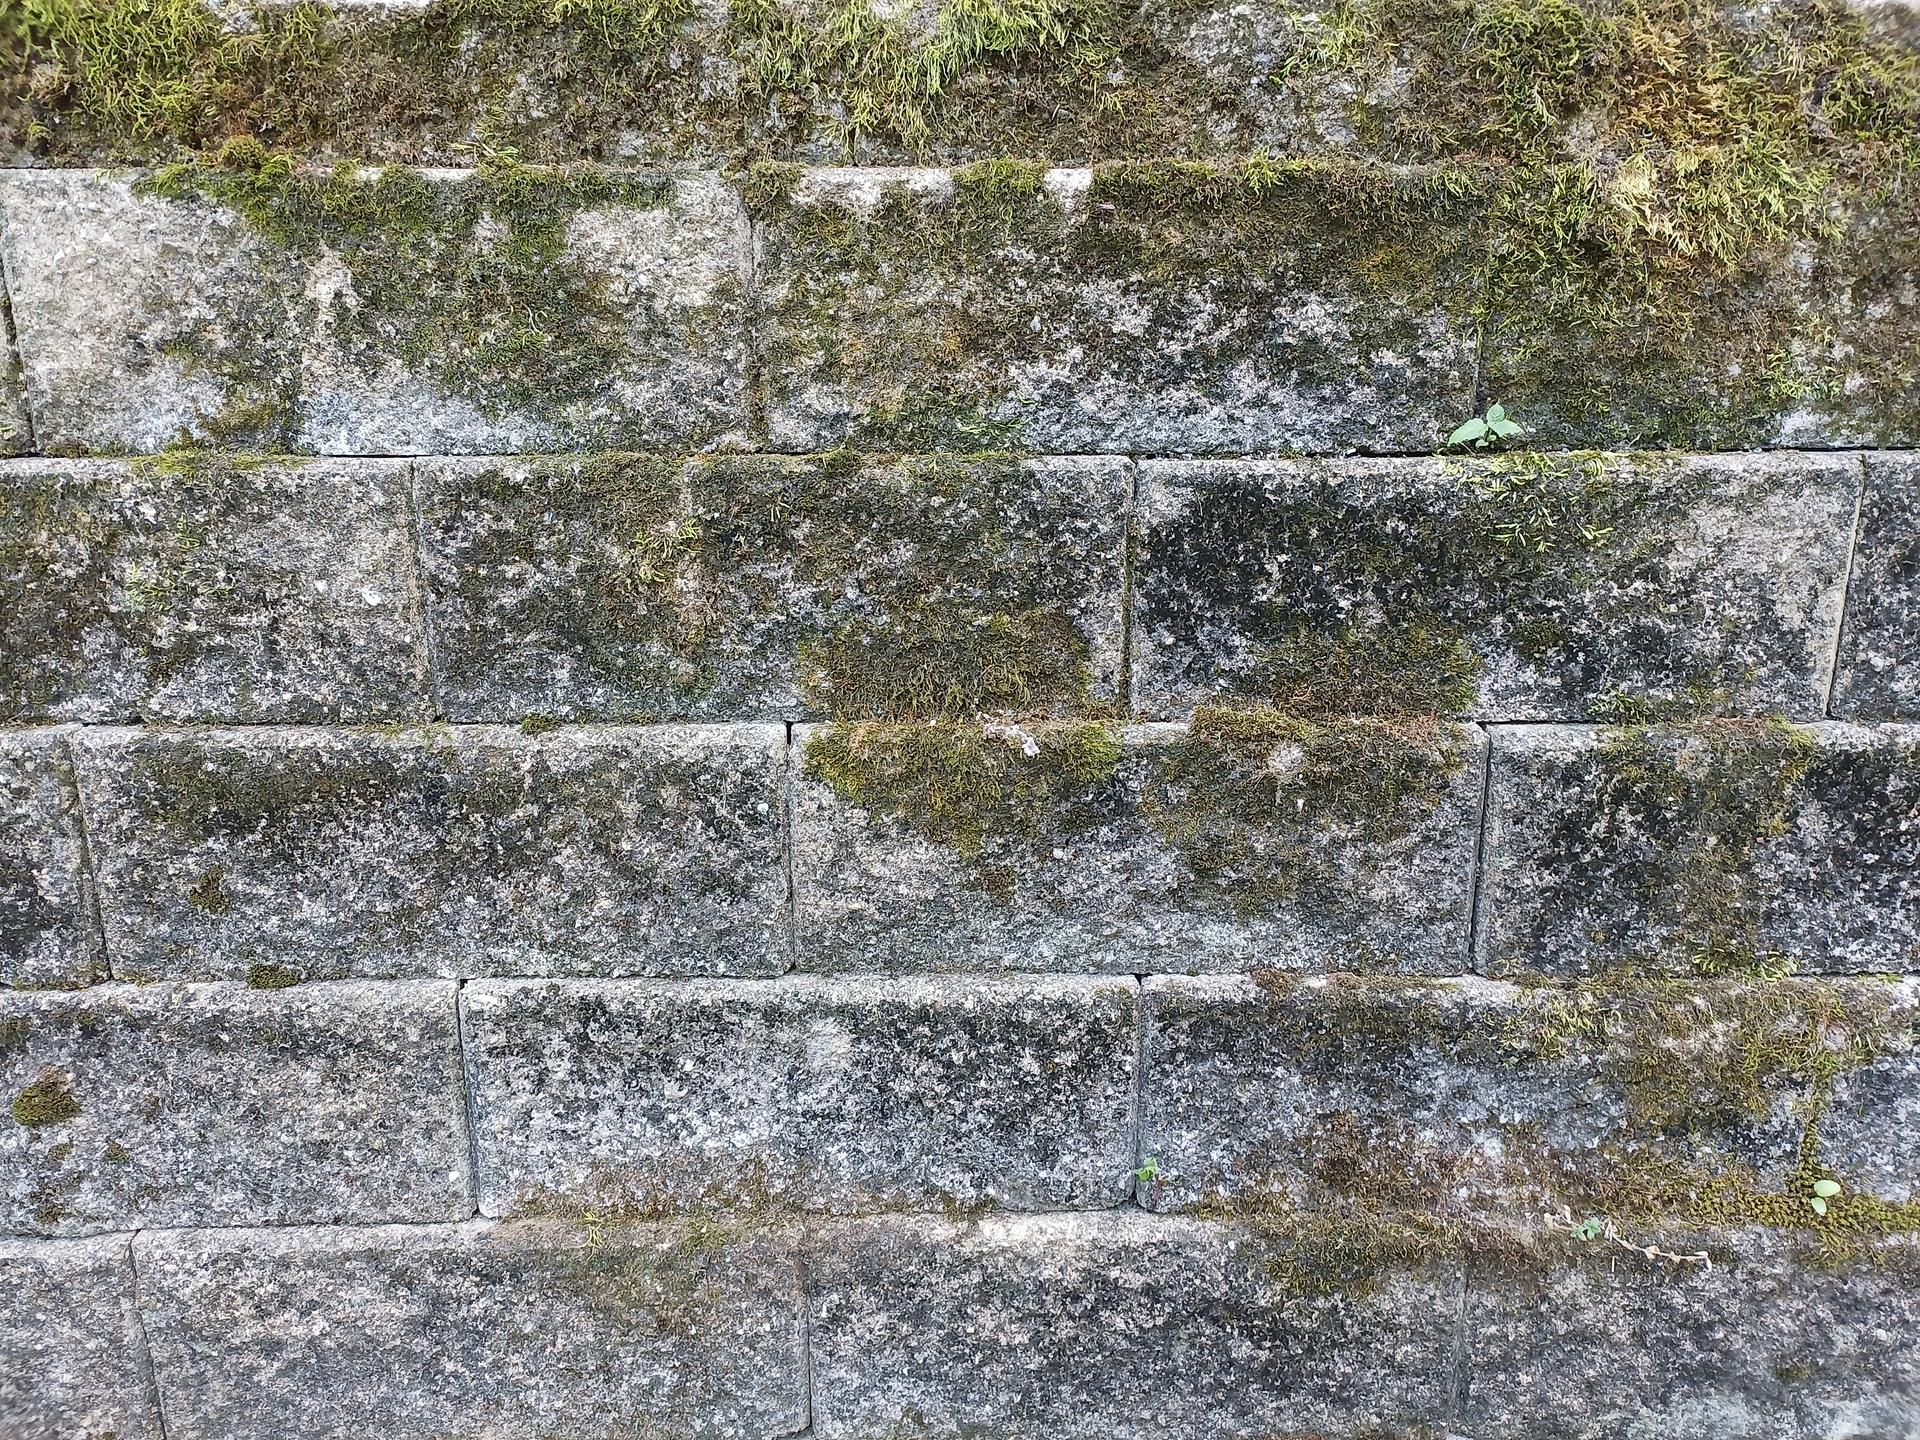 blu g90 pro review camera samples brick